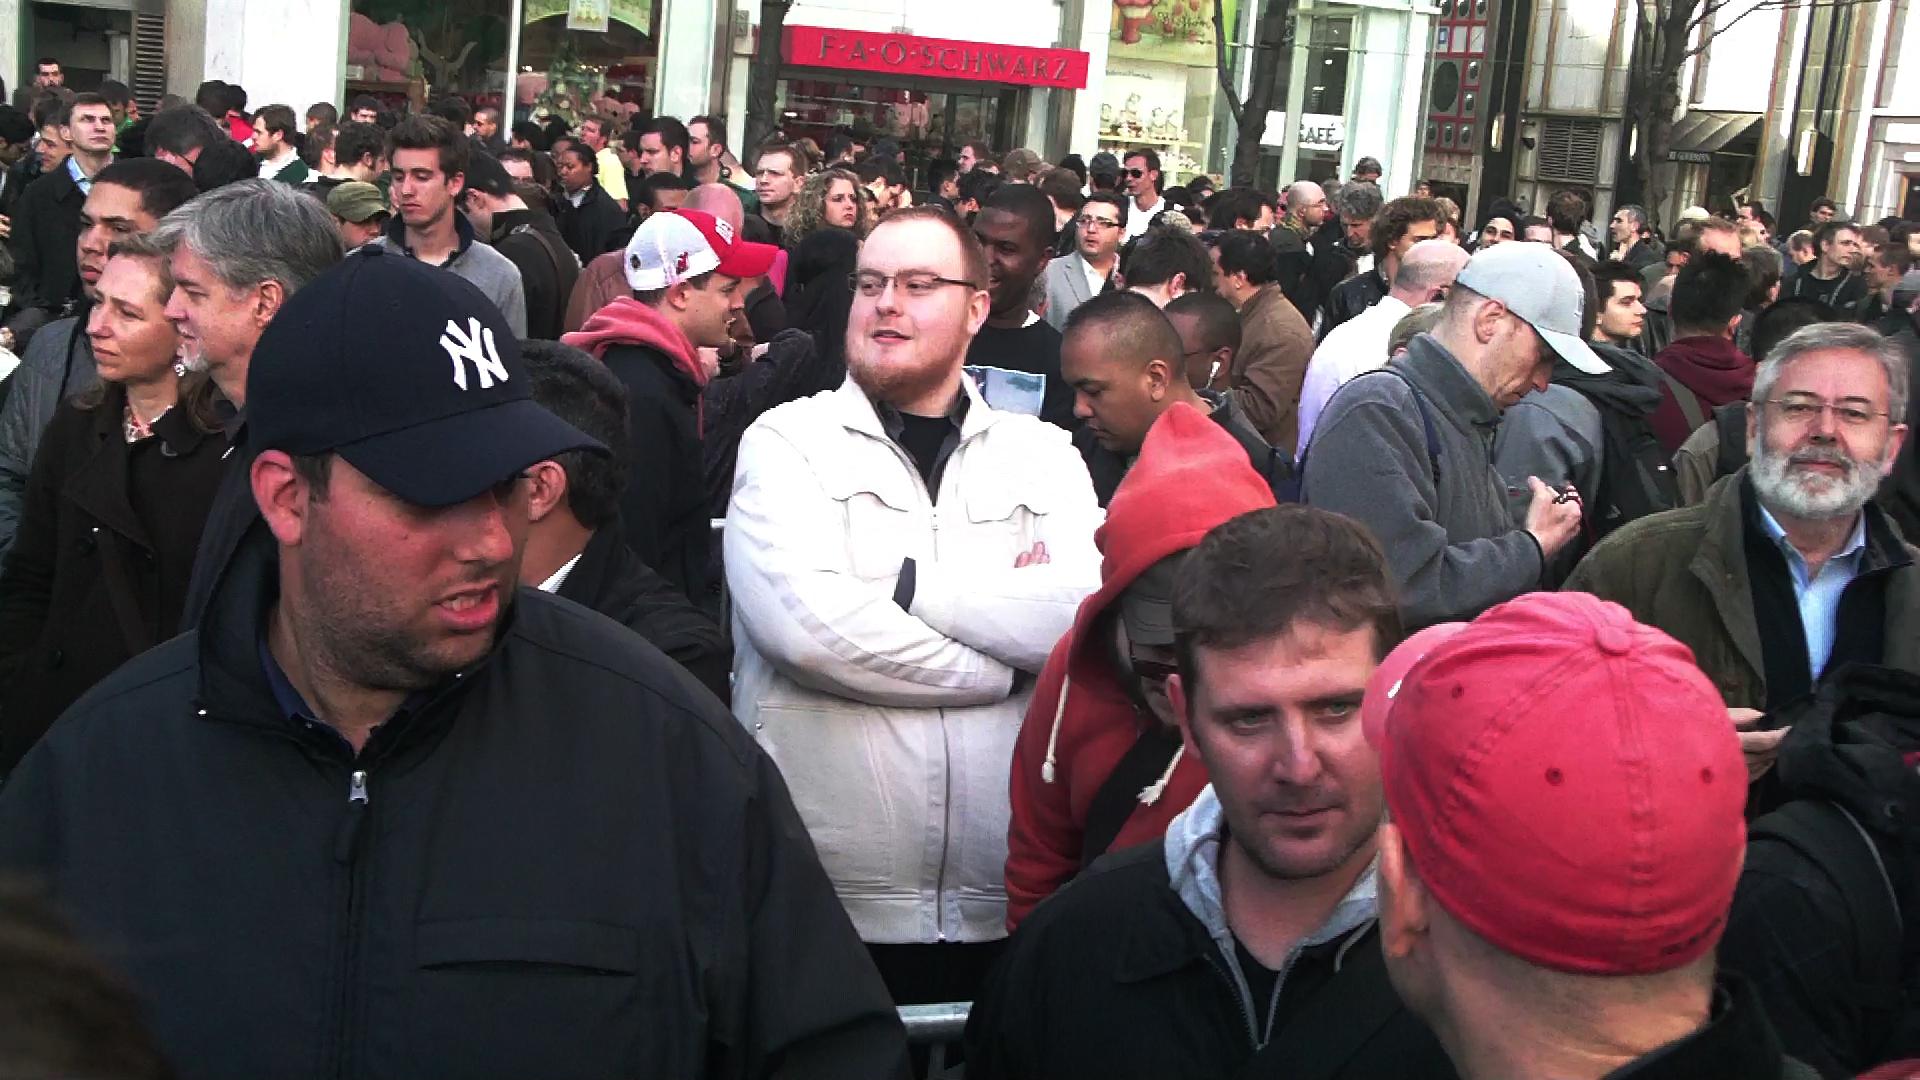 crowd1.jpg